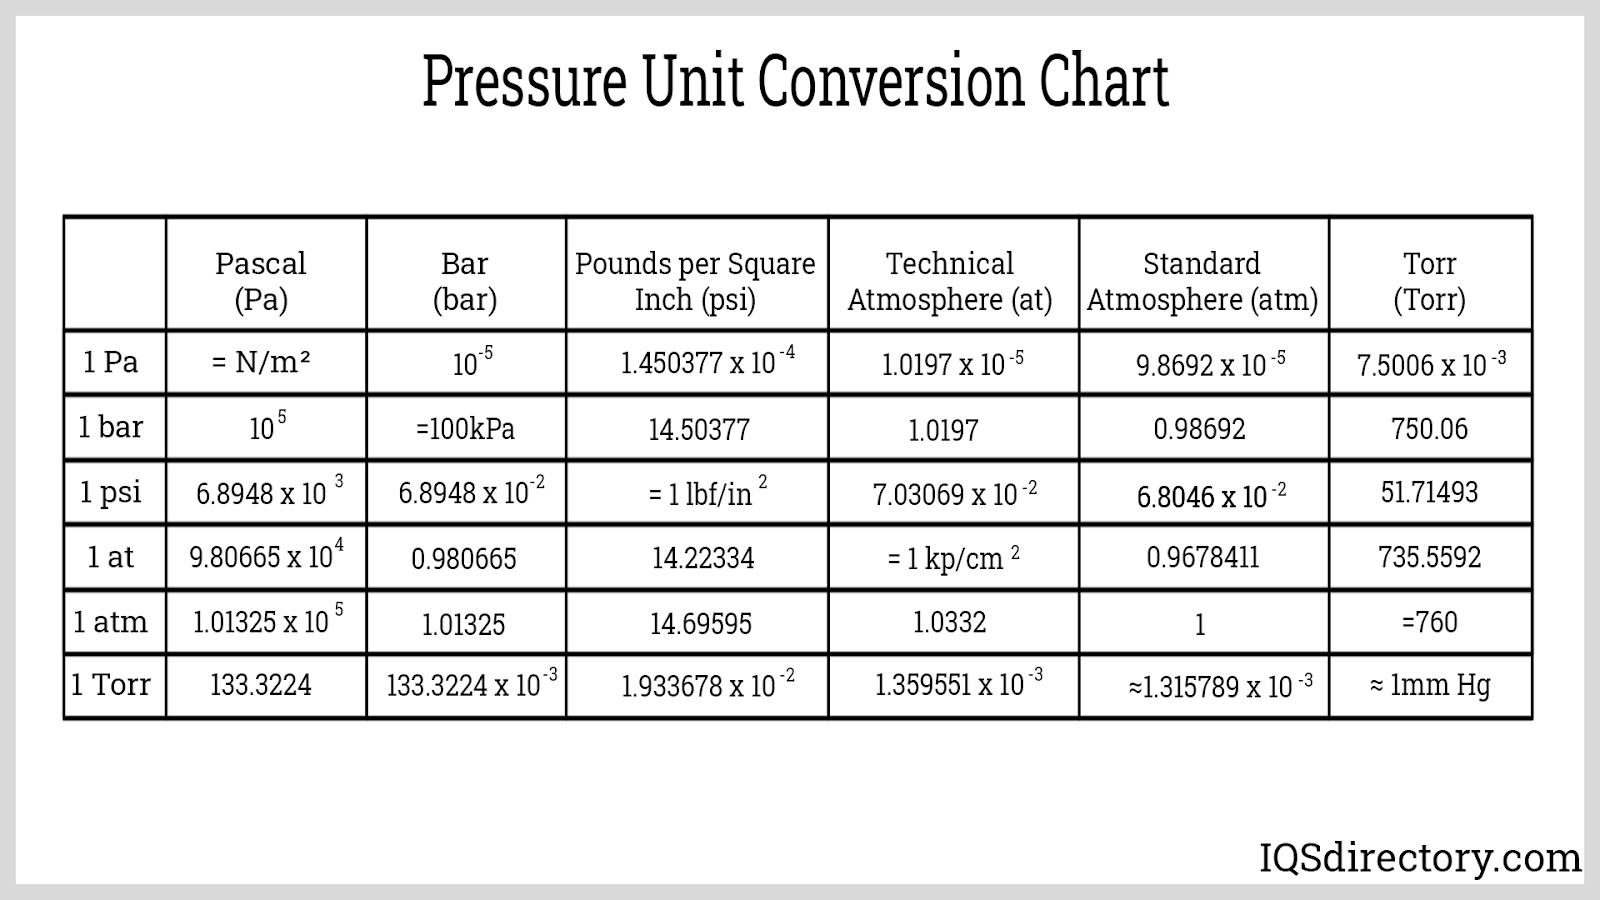 Pressure Unit Conversion Chart